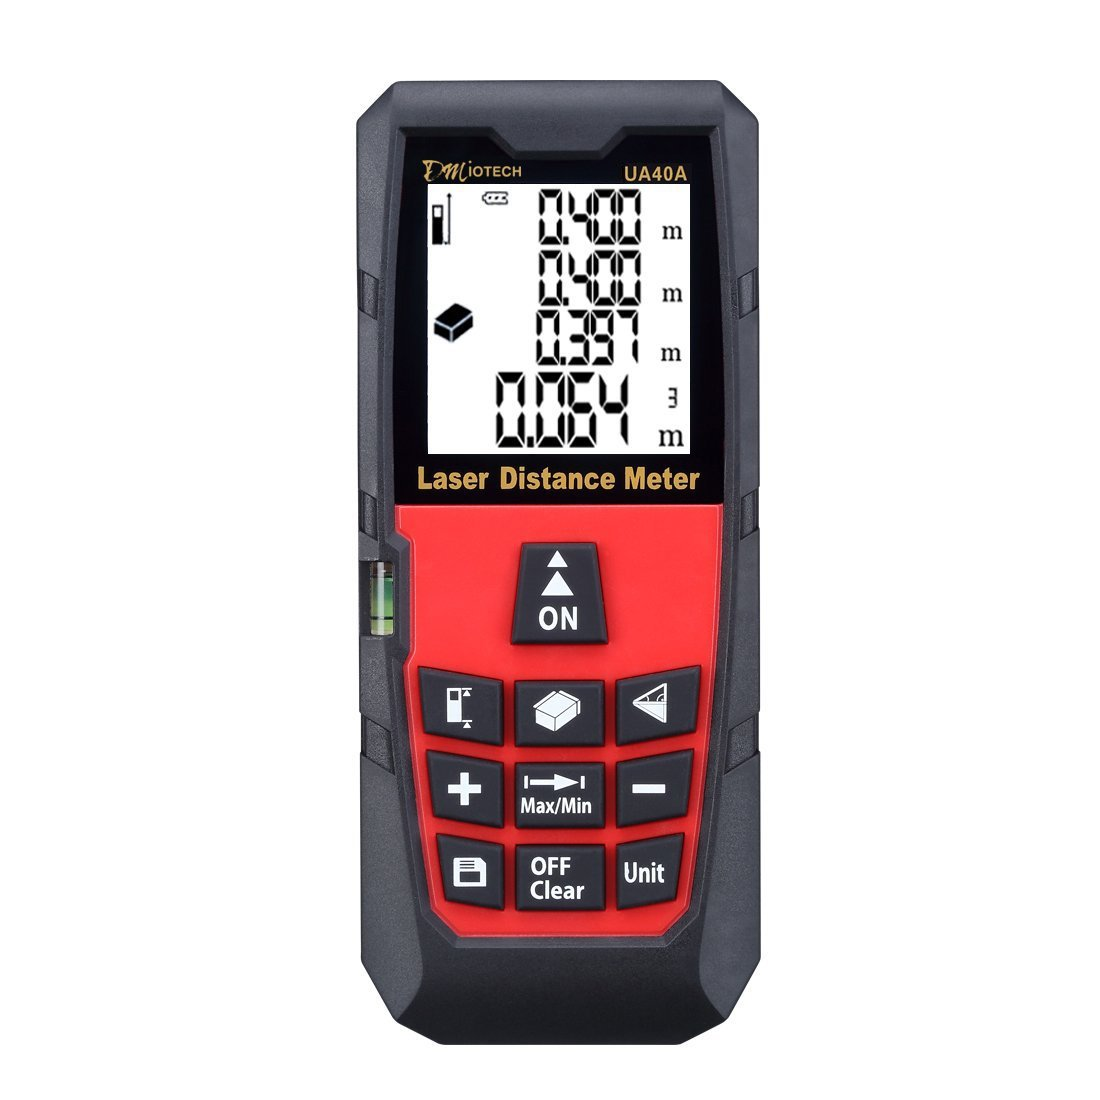 DAXGD Tel/émetro l/áser digital port/átil 40m con nivel de burbuja /área y volumen Rango de medici/ón de alta precisi/ón y gran pantalla LCD retroiluminada para medir distancia